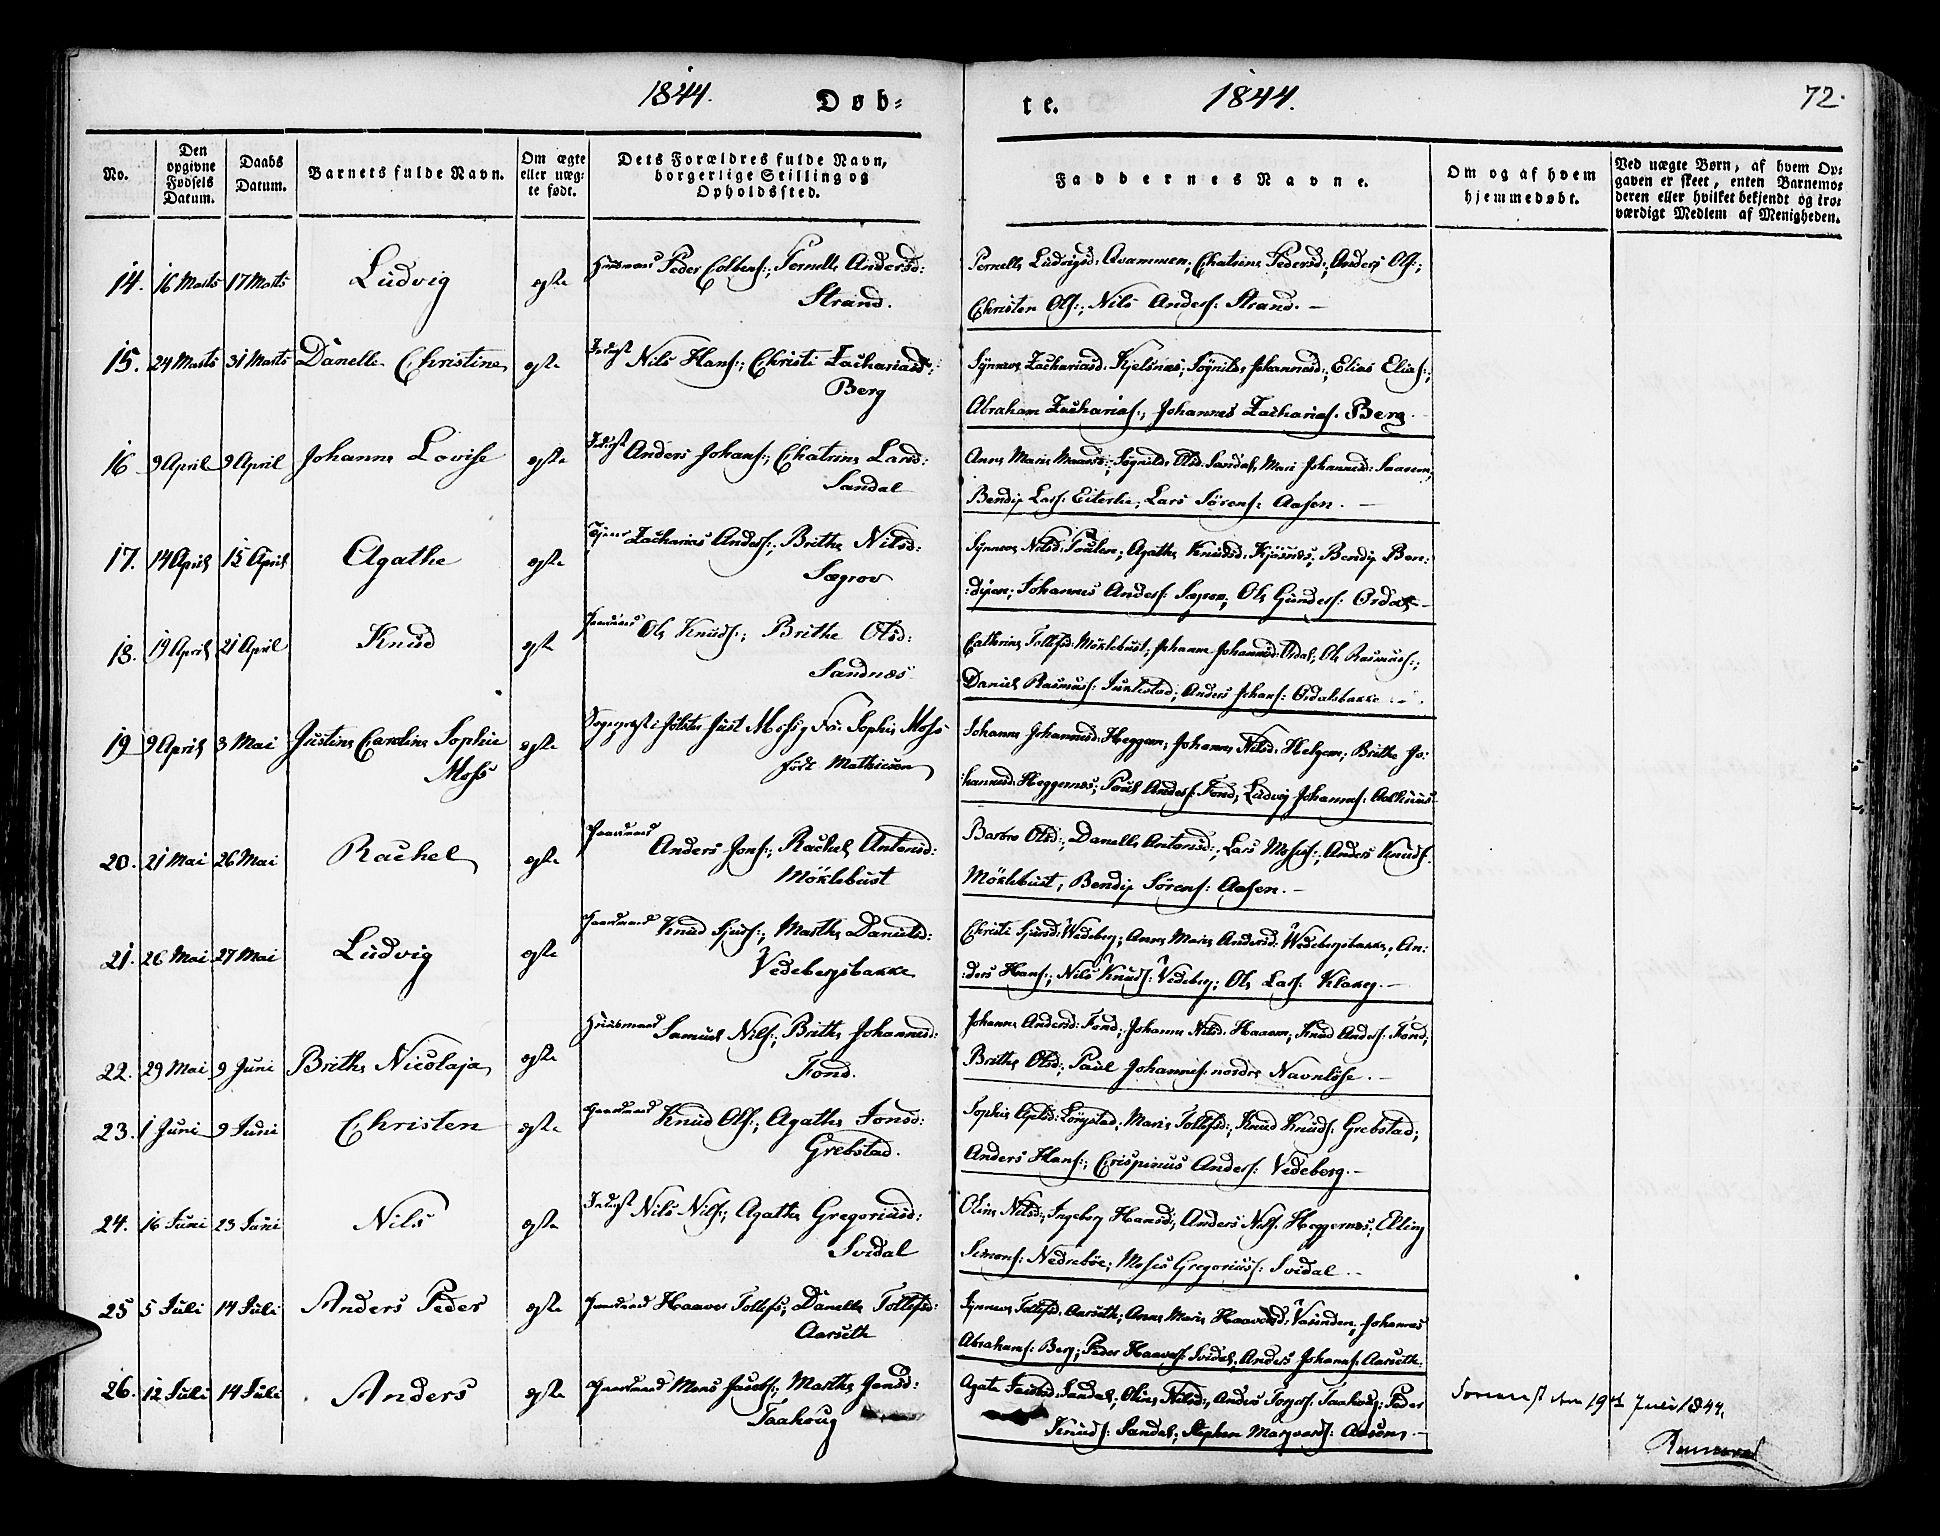 SAB, Jølster sokneprestembete, H/Haa/Haaa/L0009: Parish register (official) no. A 9, 1833-1848, p. 72